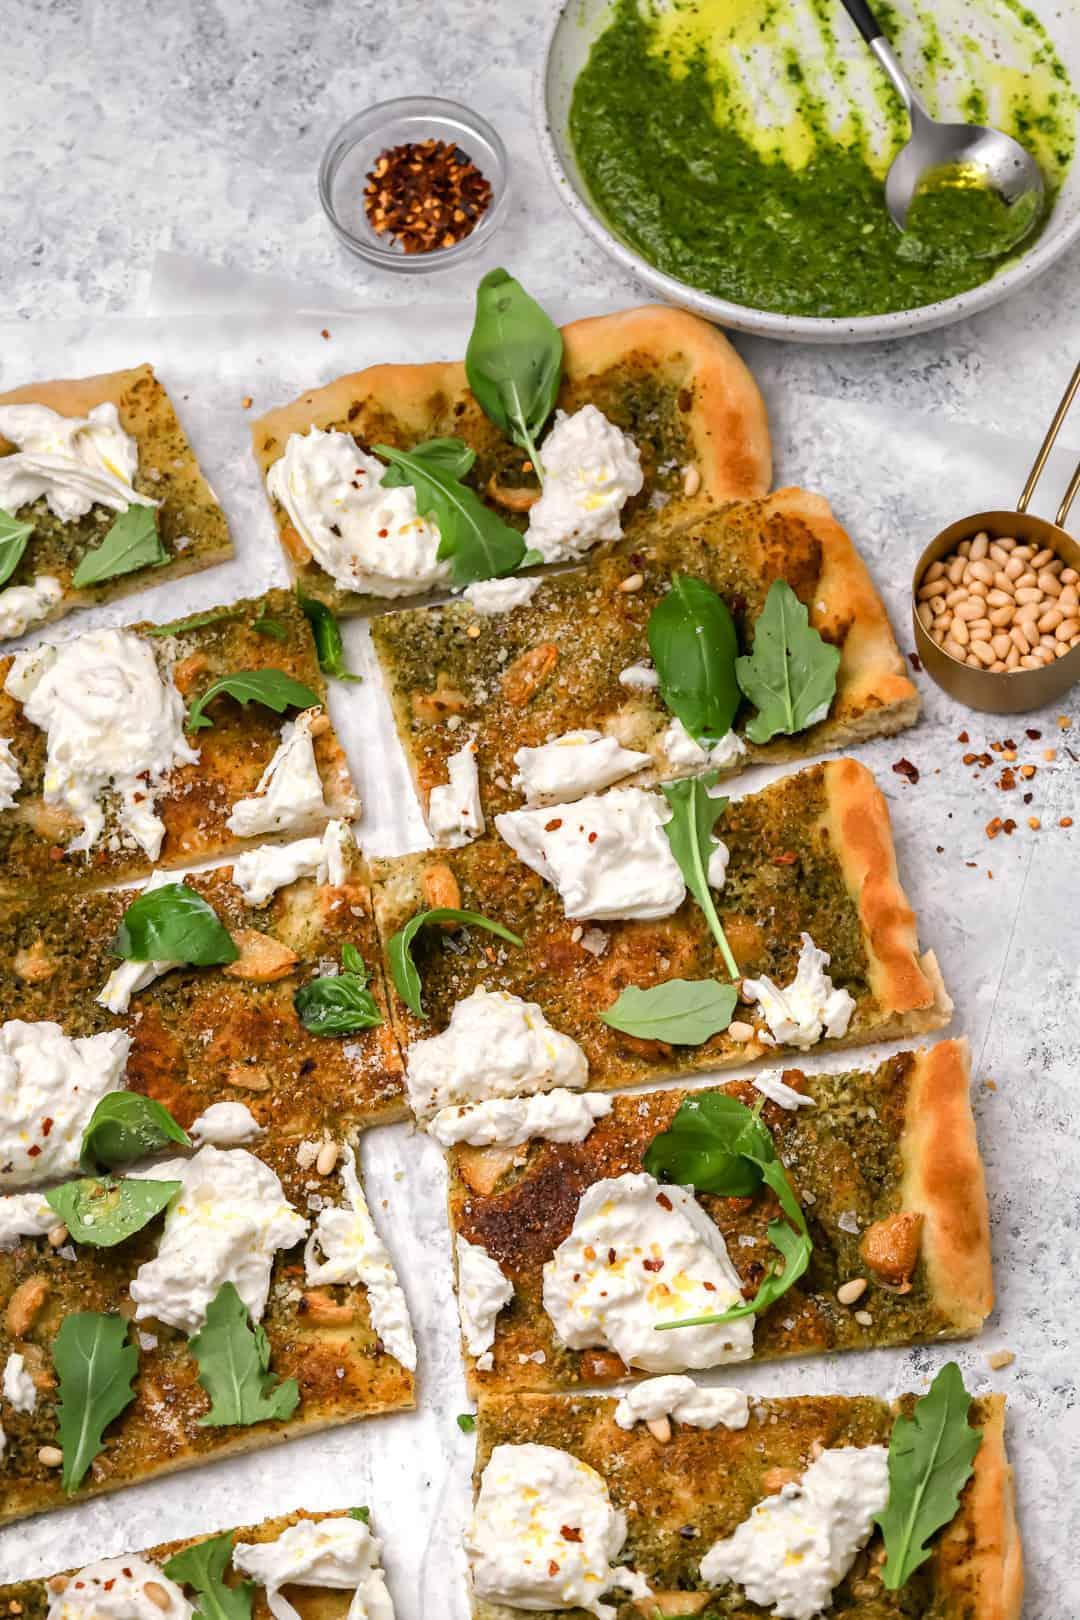 Homemade burrata pizza with garlic confit